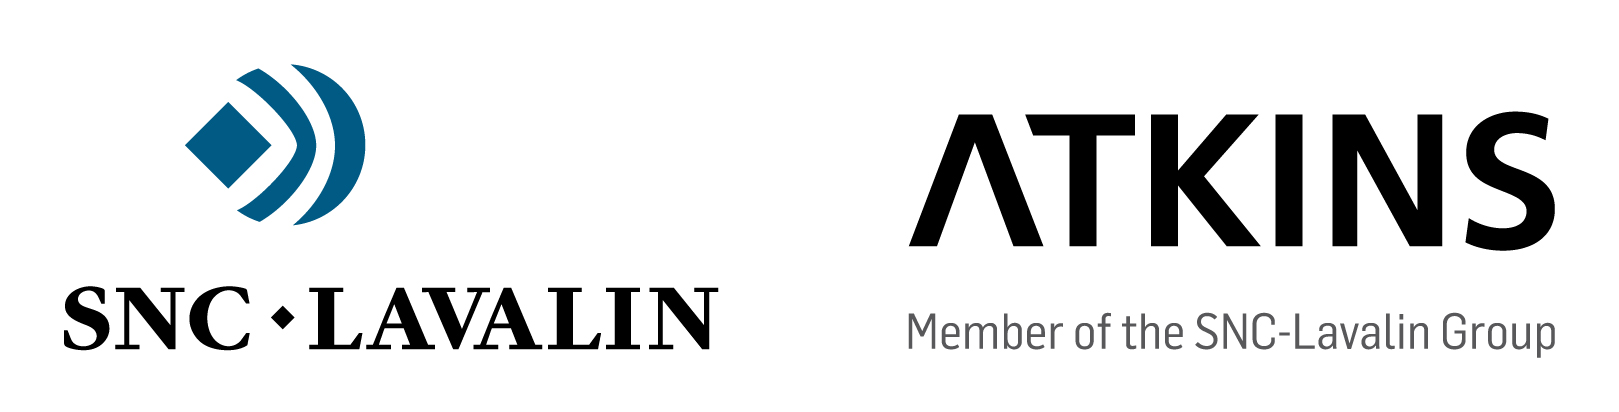 Black_SNC_atkins_logo